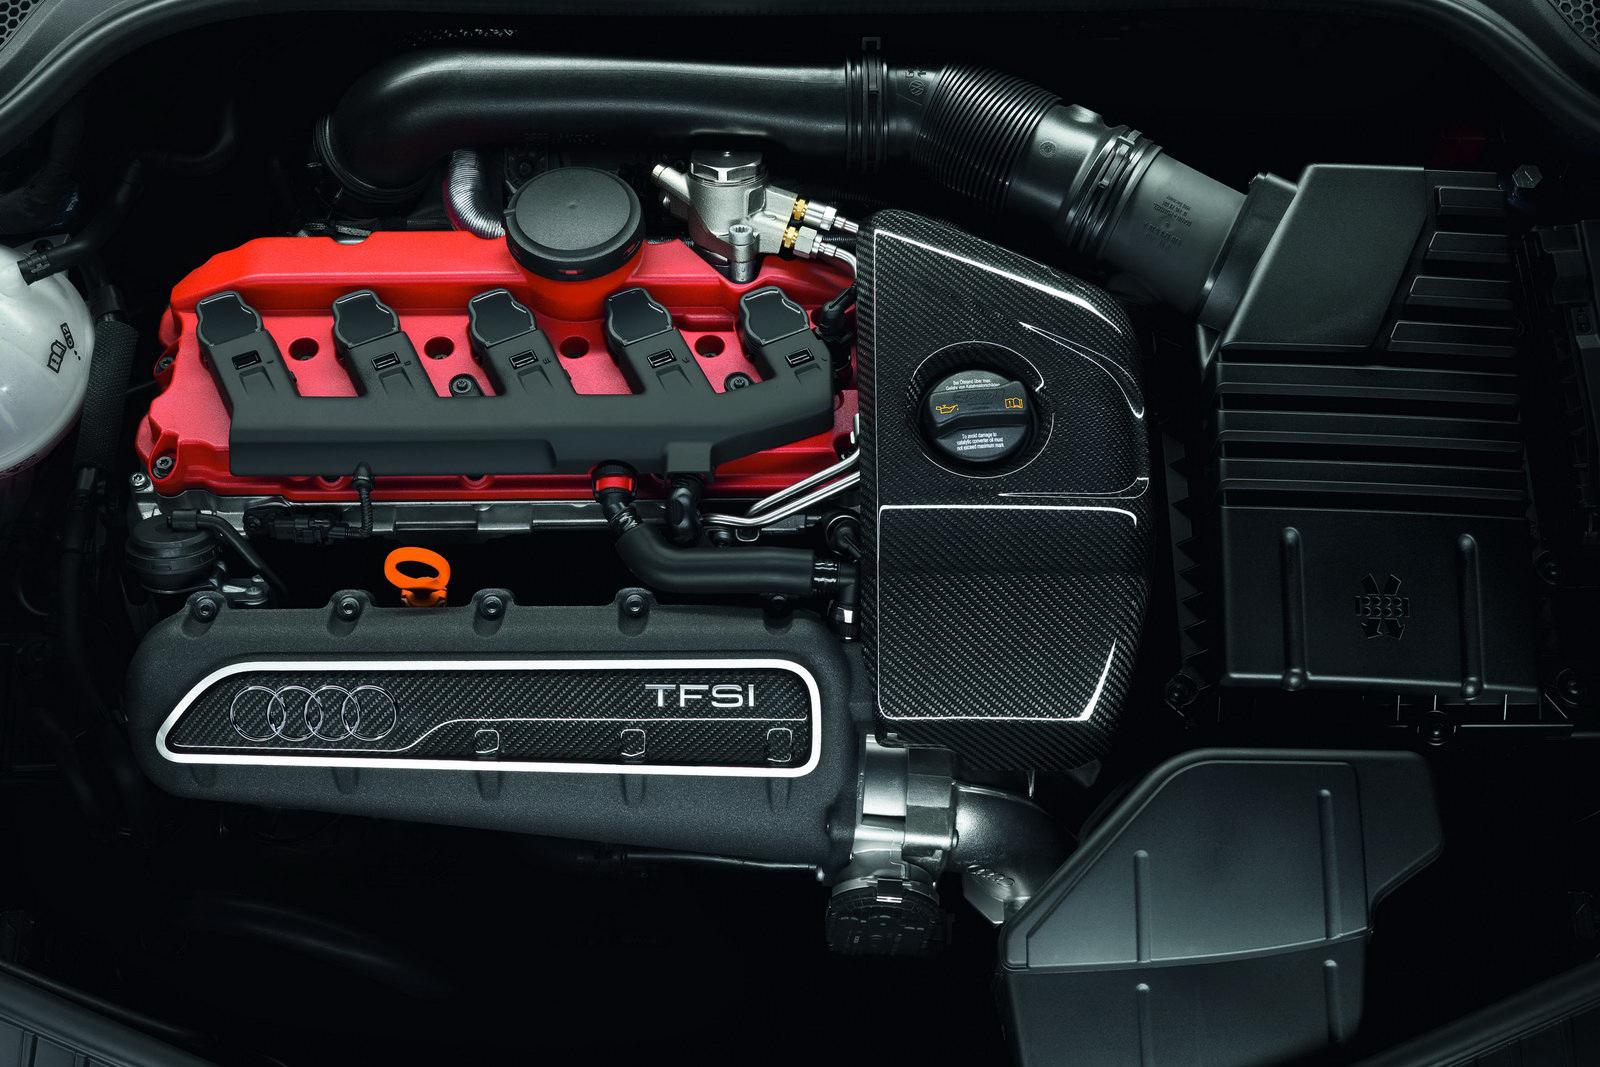 2016 Audi TT Engine